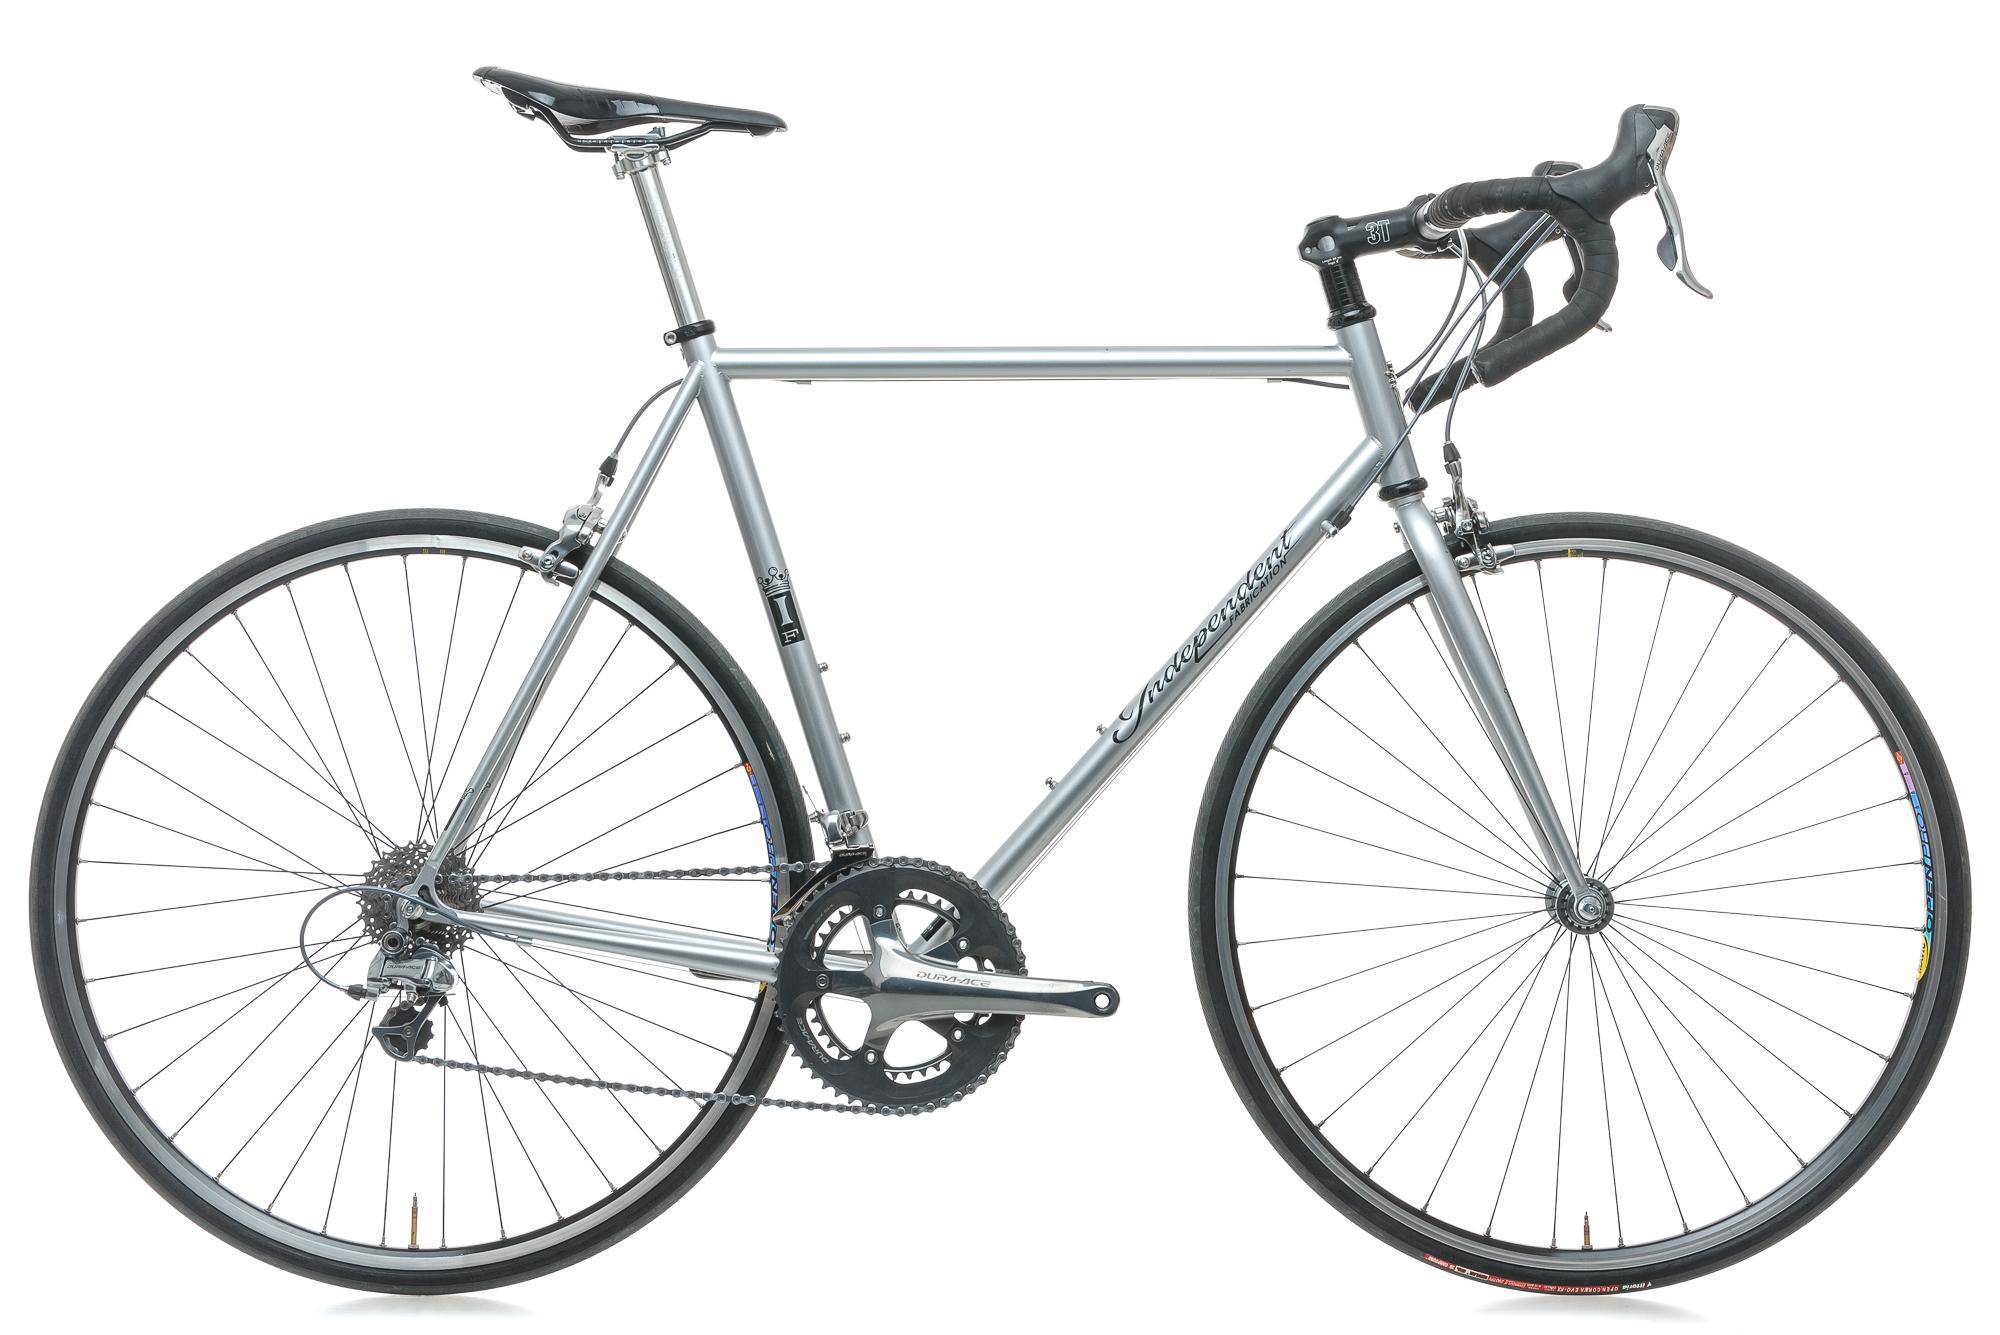 Independent Fabrication Crown Jewel Road Bike 56cm